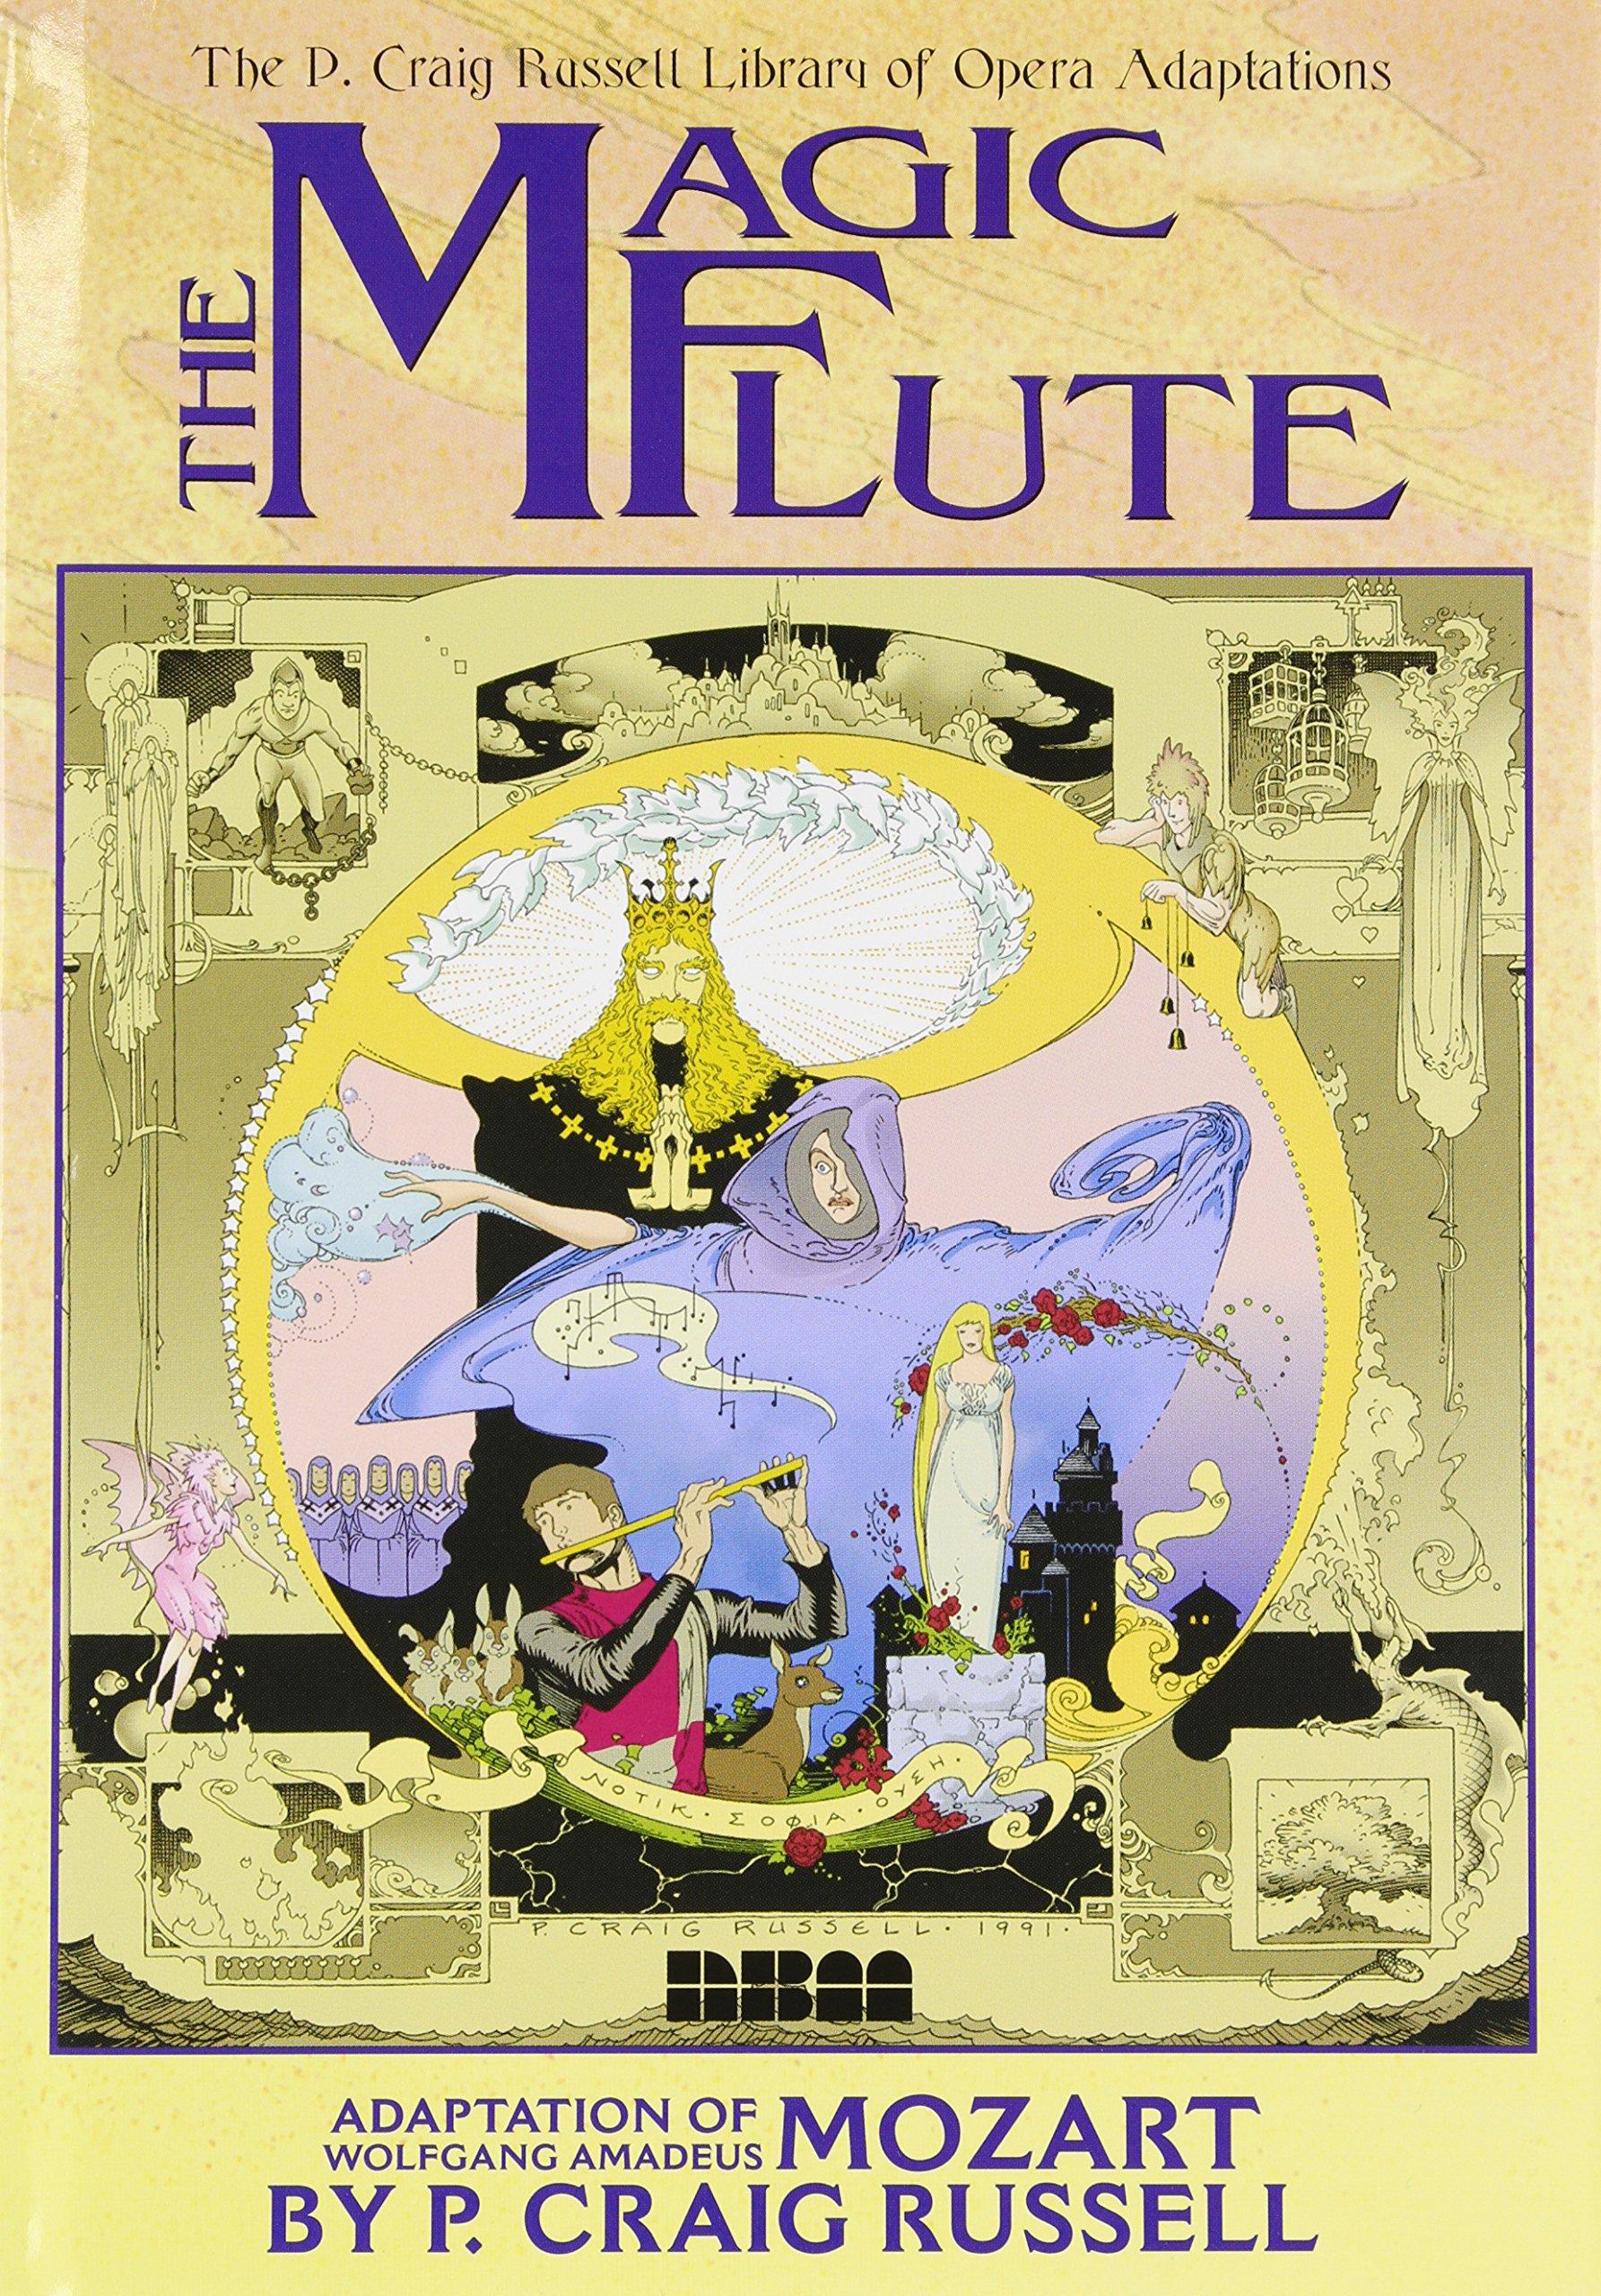 P. Craig Russell's Opera Adaptations Clothbound Set (The P. Craig Russell  Library of Opera Adaptations): P. Craig Russell: 9781561637553: Amazon.com:  Books